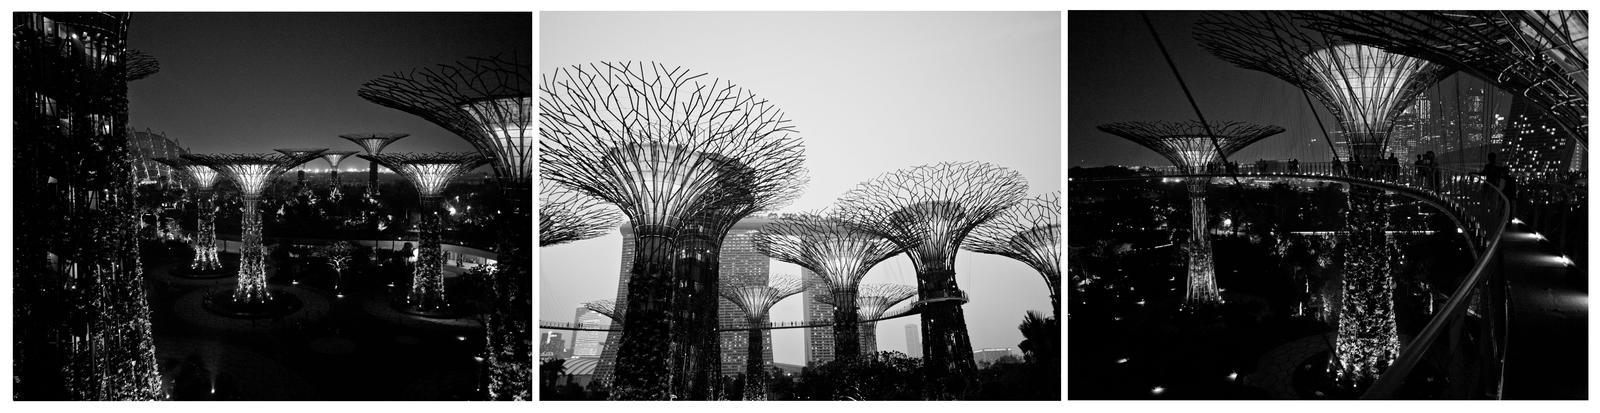 Trees of Steel